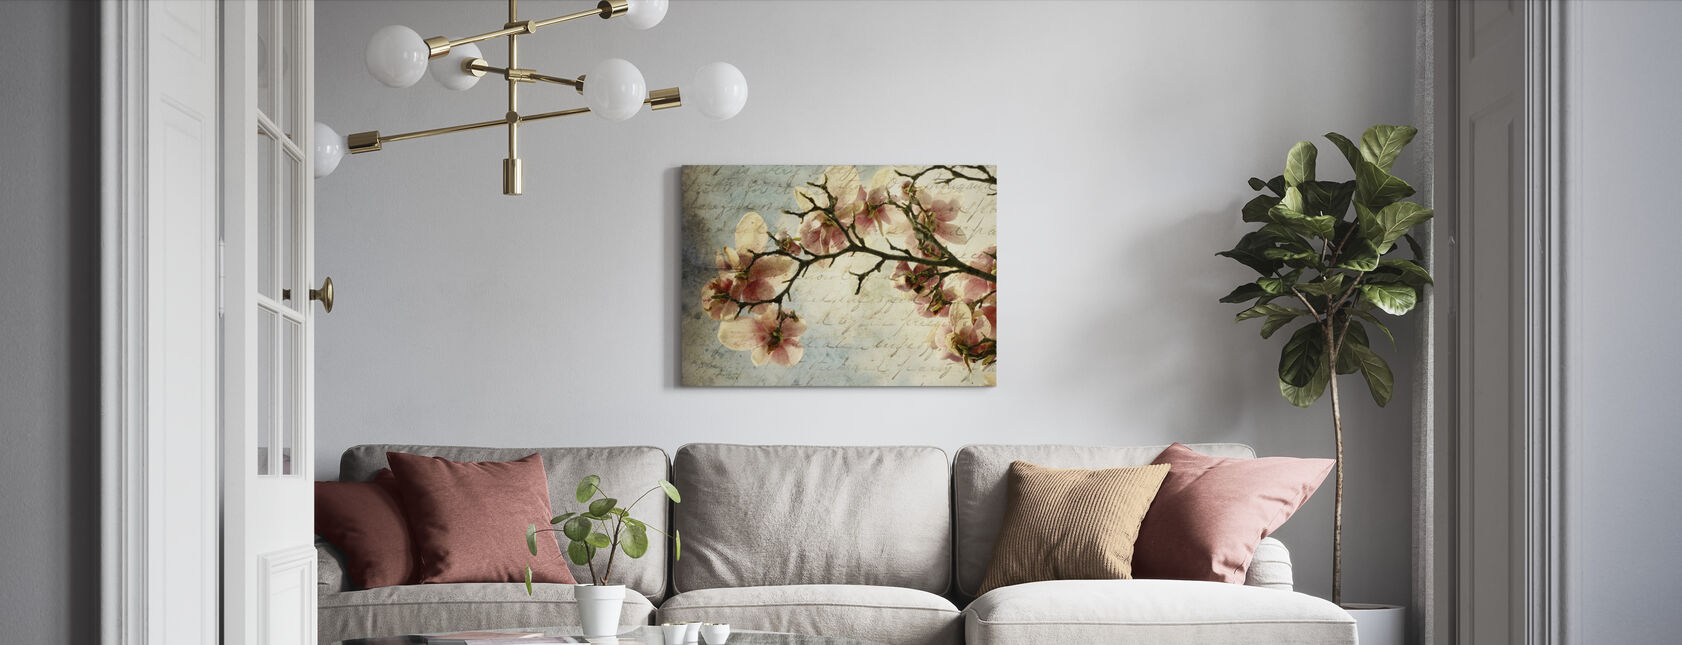 Magnolia Muistoja - Canvastaulu - Olohuone